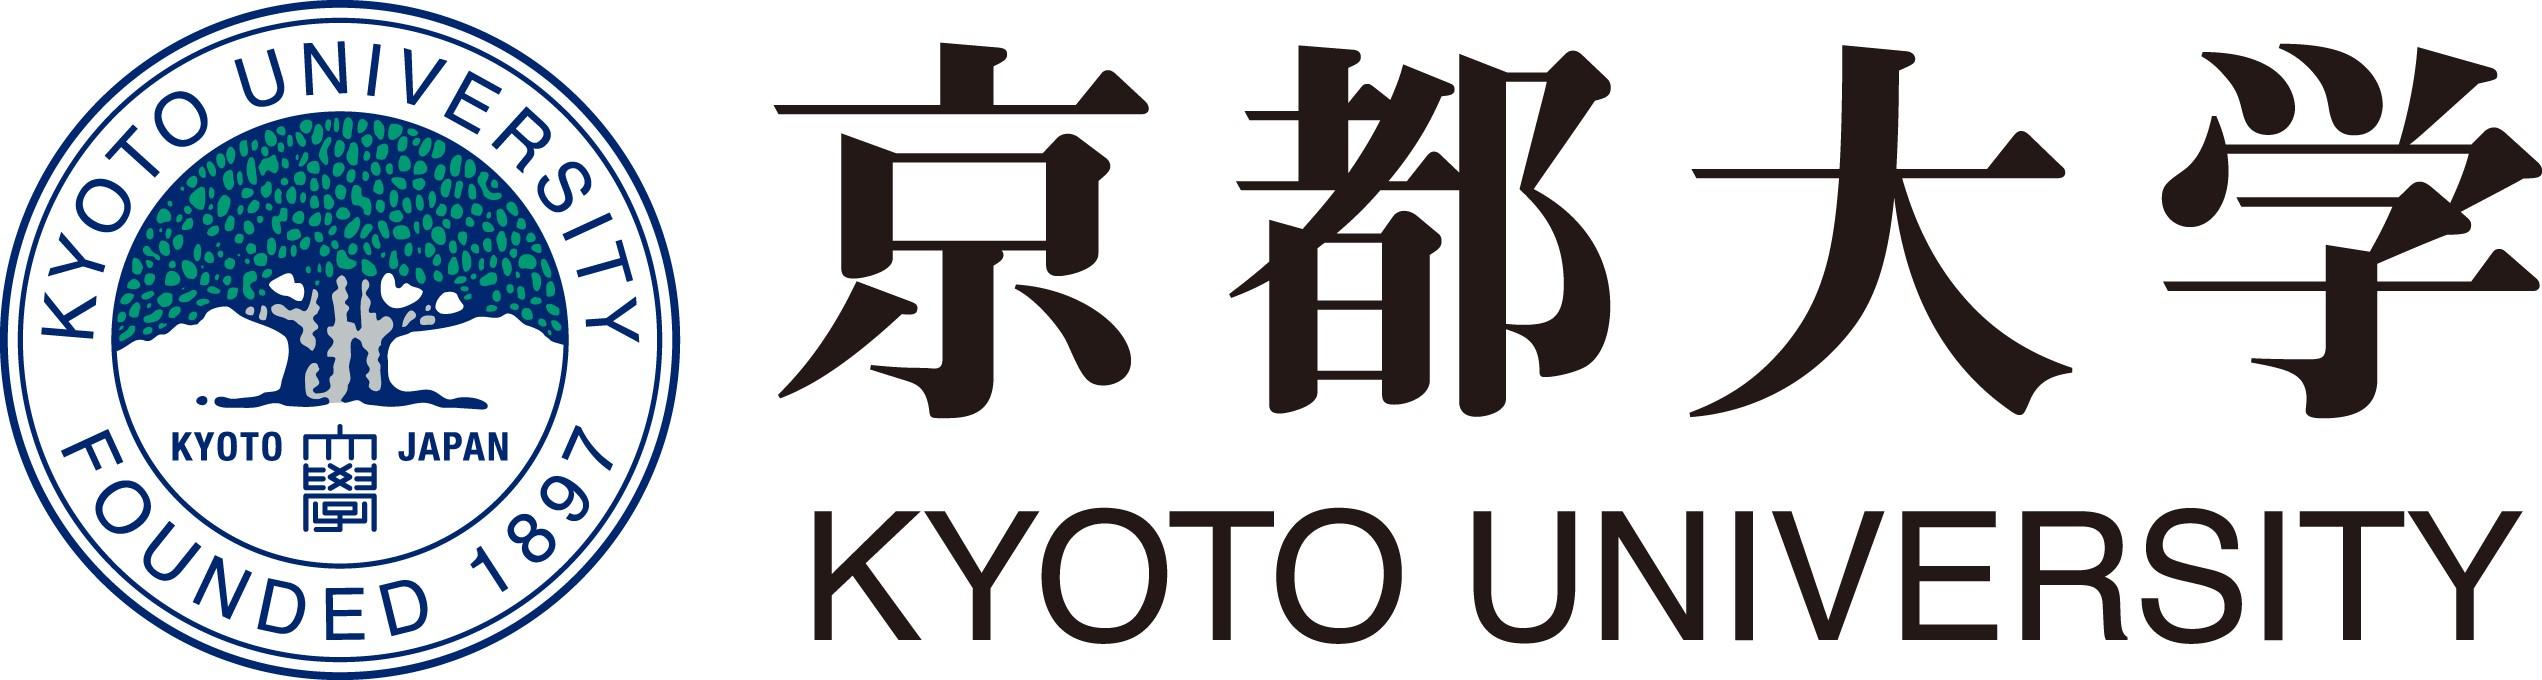 KyotoUniv_logo.jpg